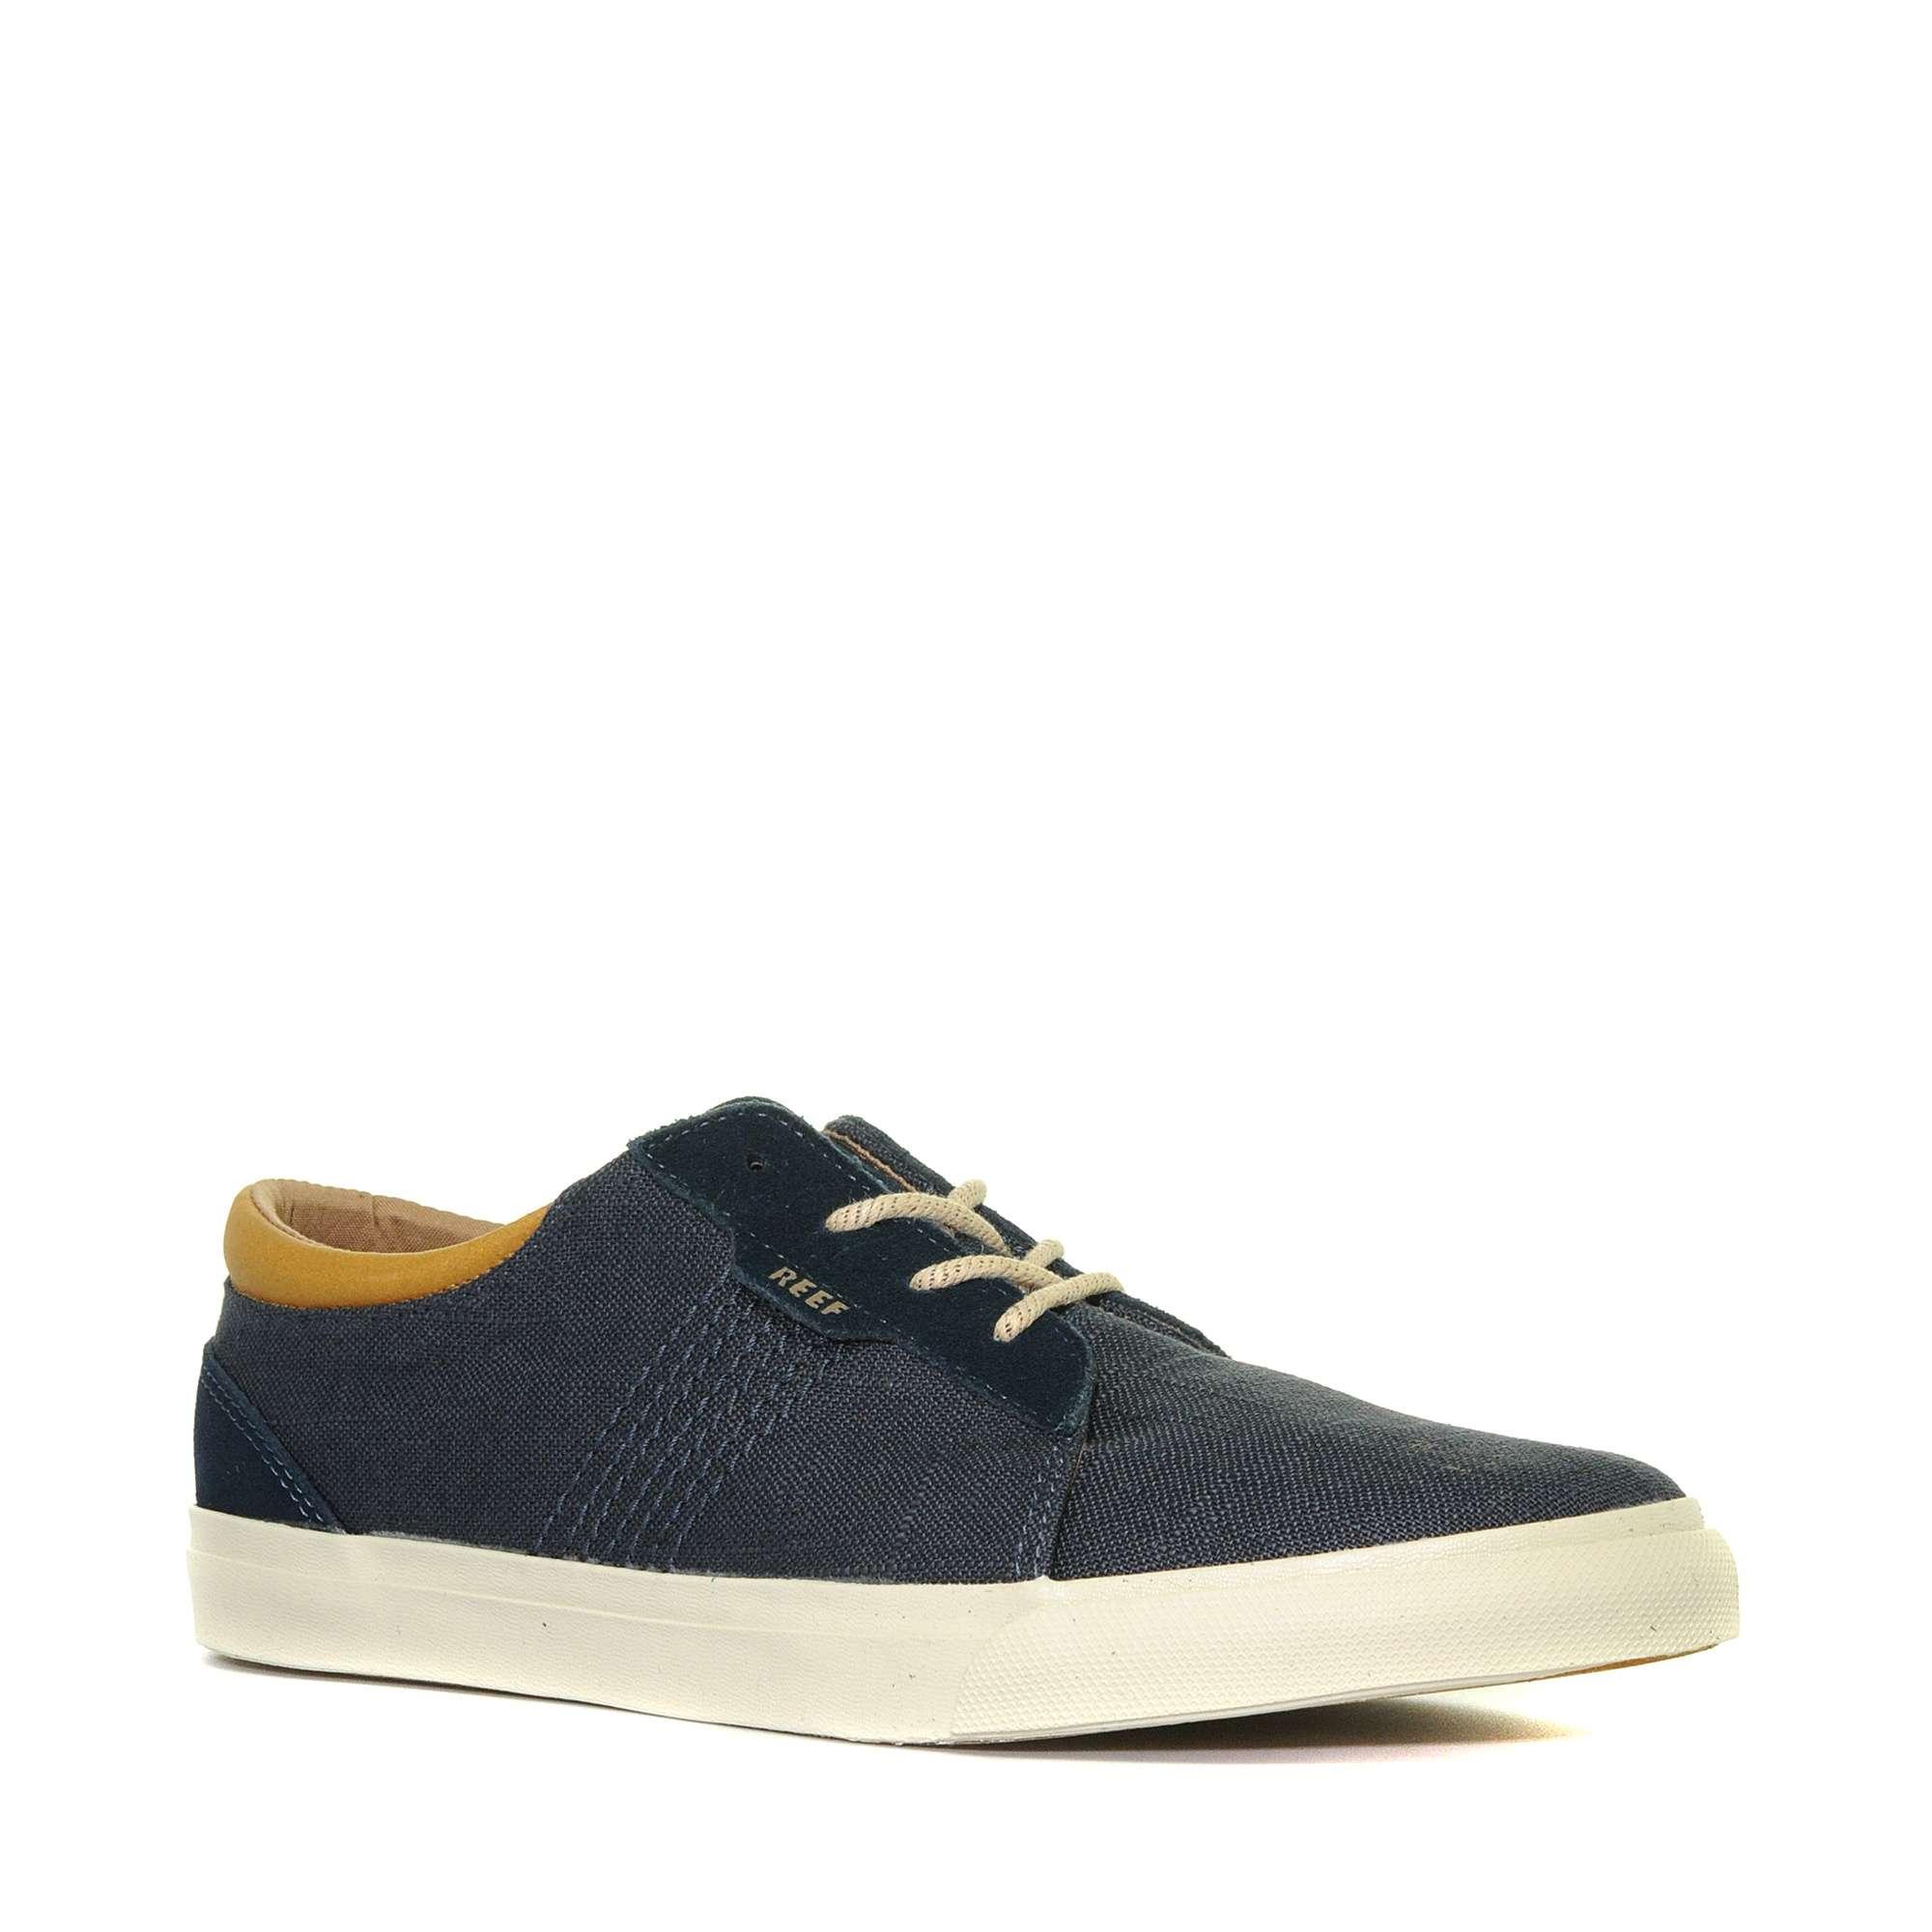 REEF Men's Ridge TX Sneaker